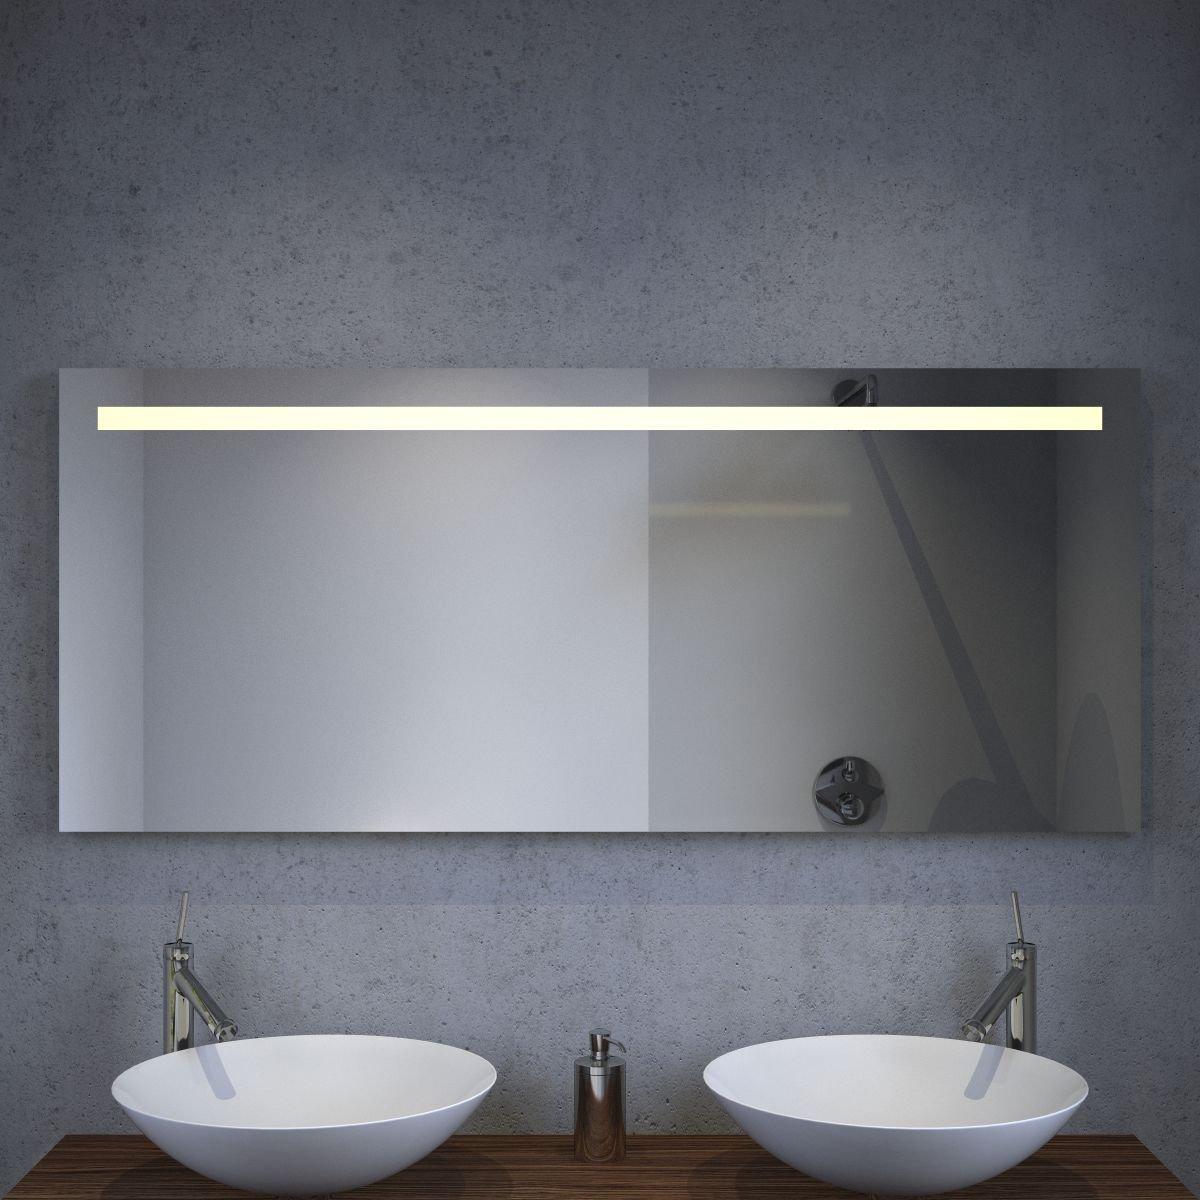 bol.com | LED badkamer spiegel met verwarming en sensor 140x60 cm